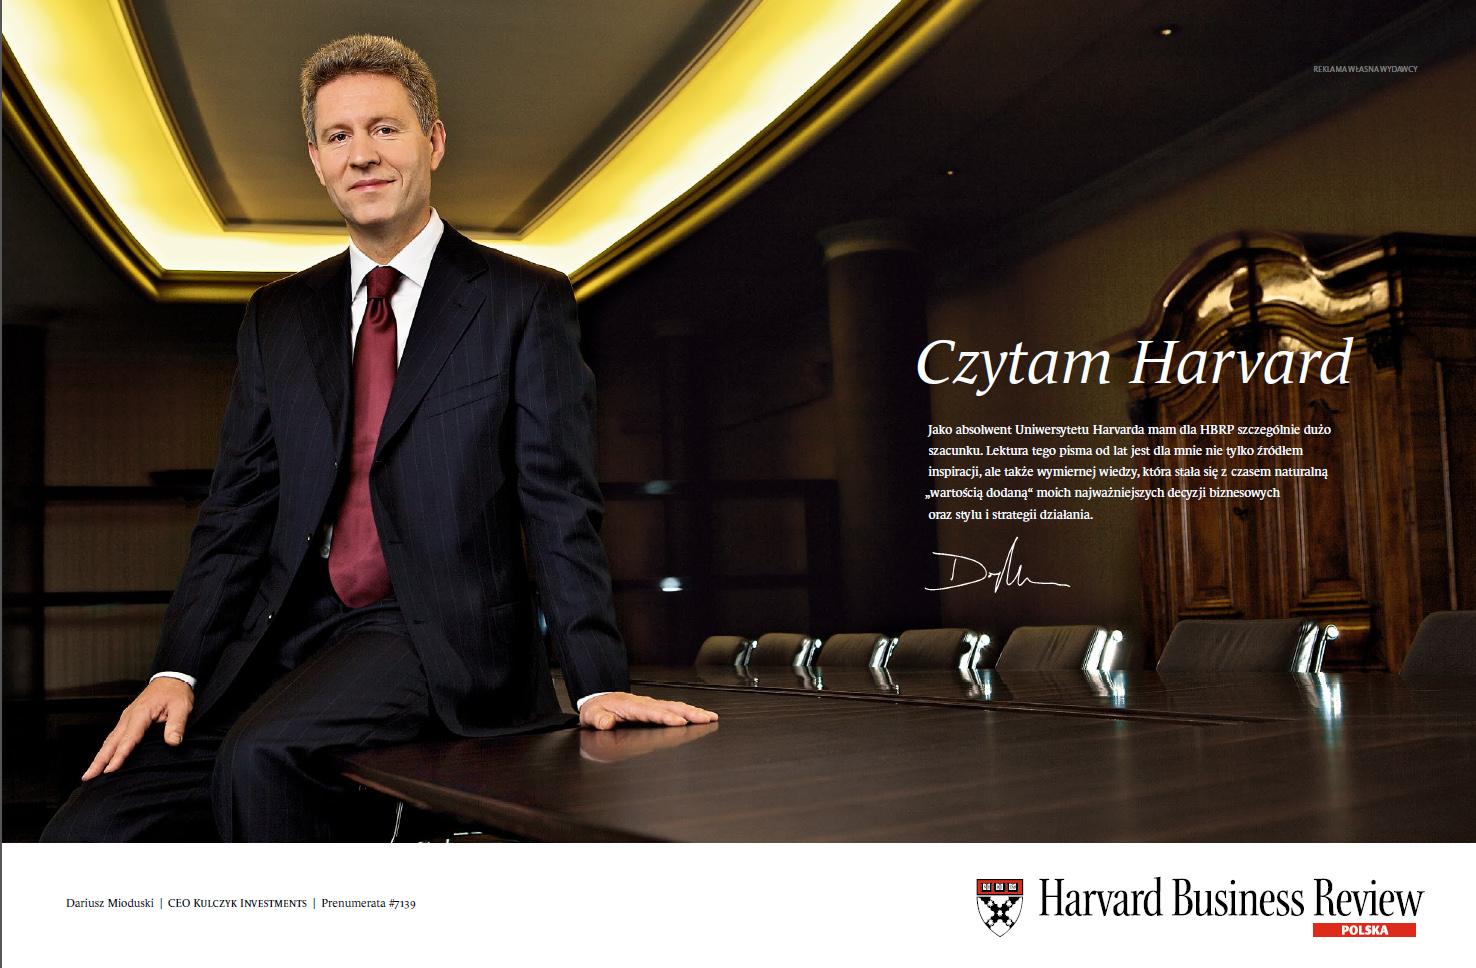 Dariusz Mioduski, CEO Kulczyk Investments